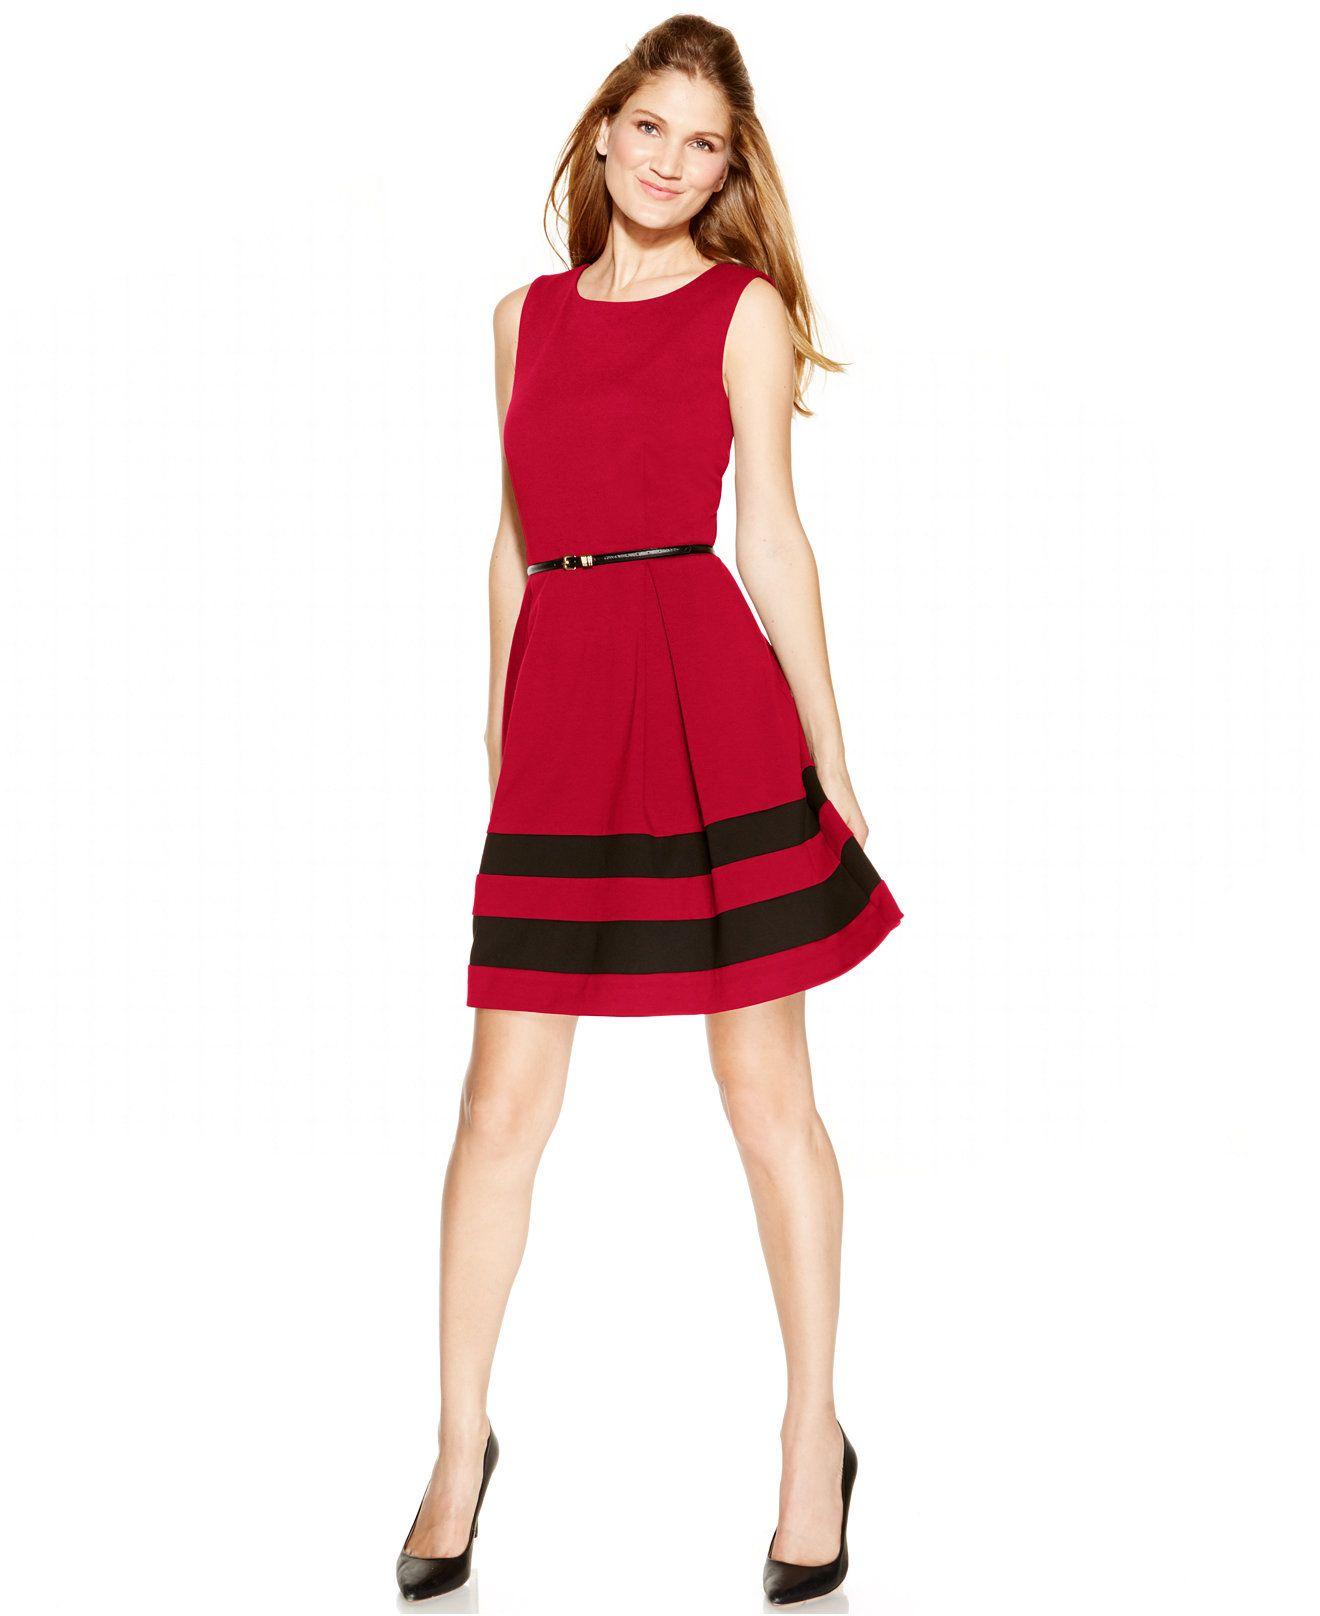 144add66d634 Macys Semi Formal Petite Dresses